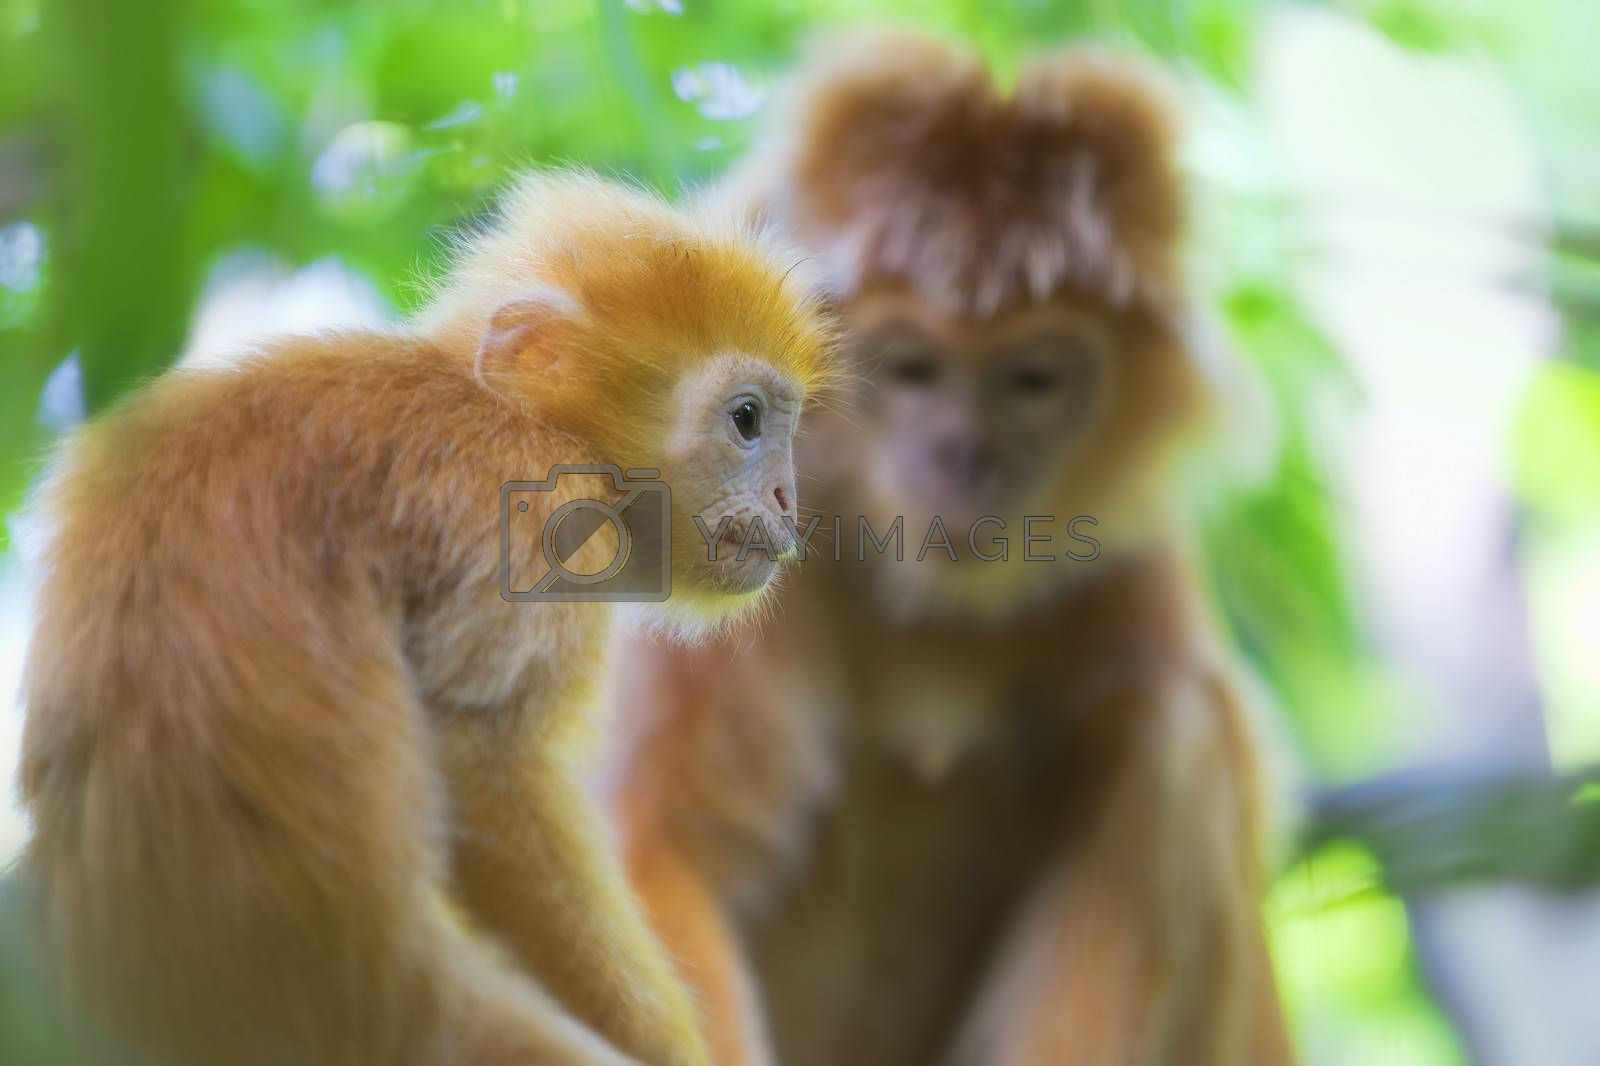 Maroone Leaf Monkeys in the wild of Borneo